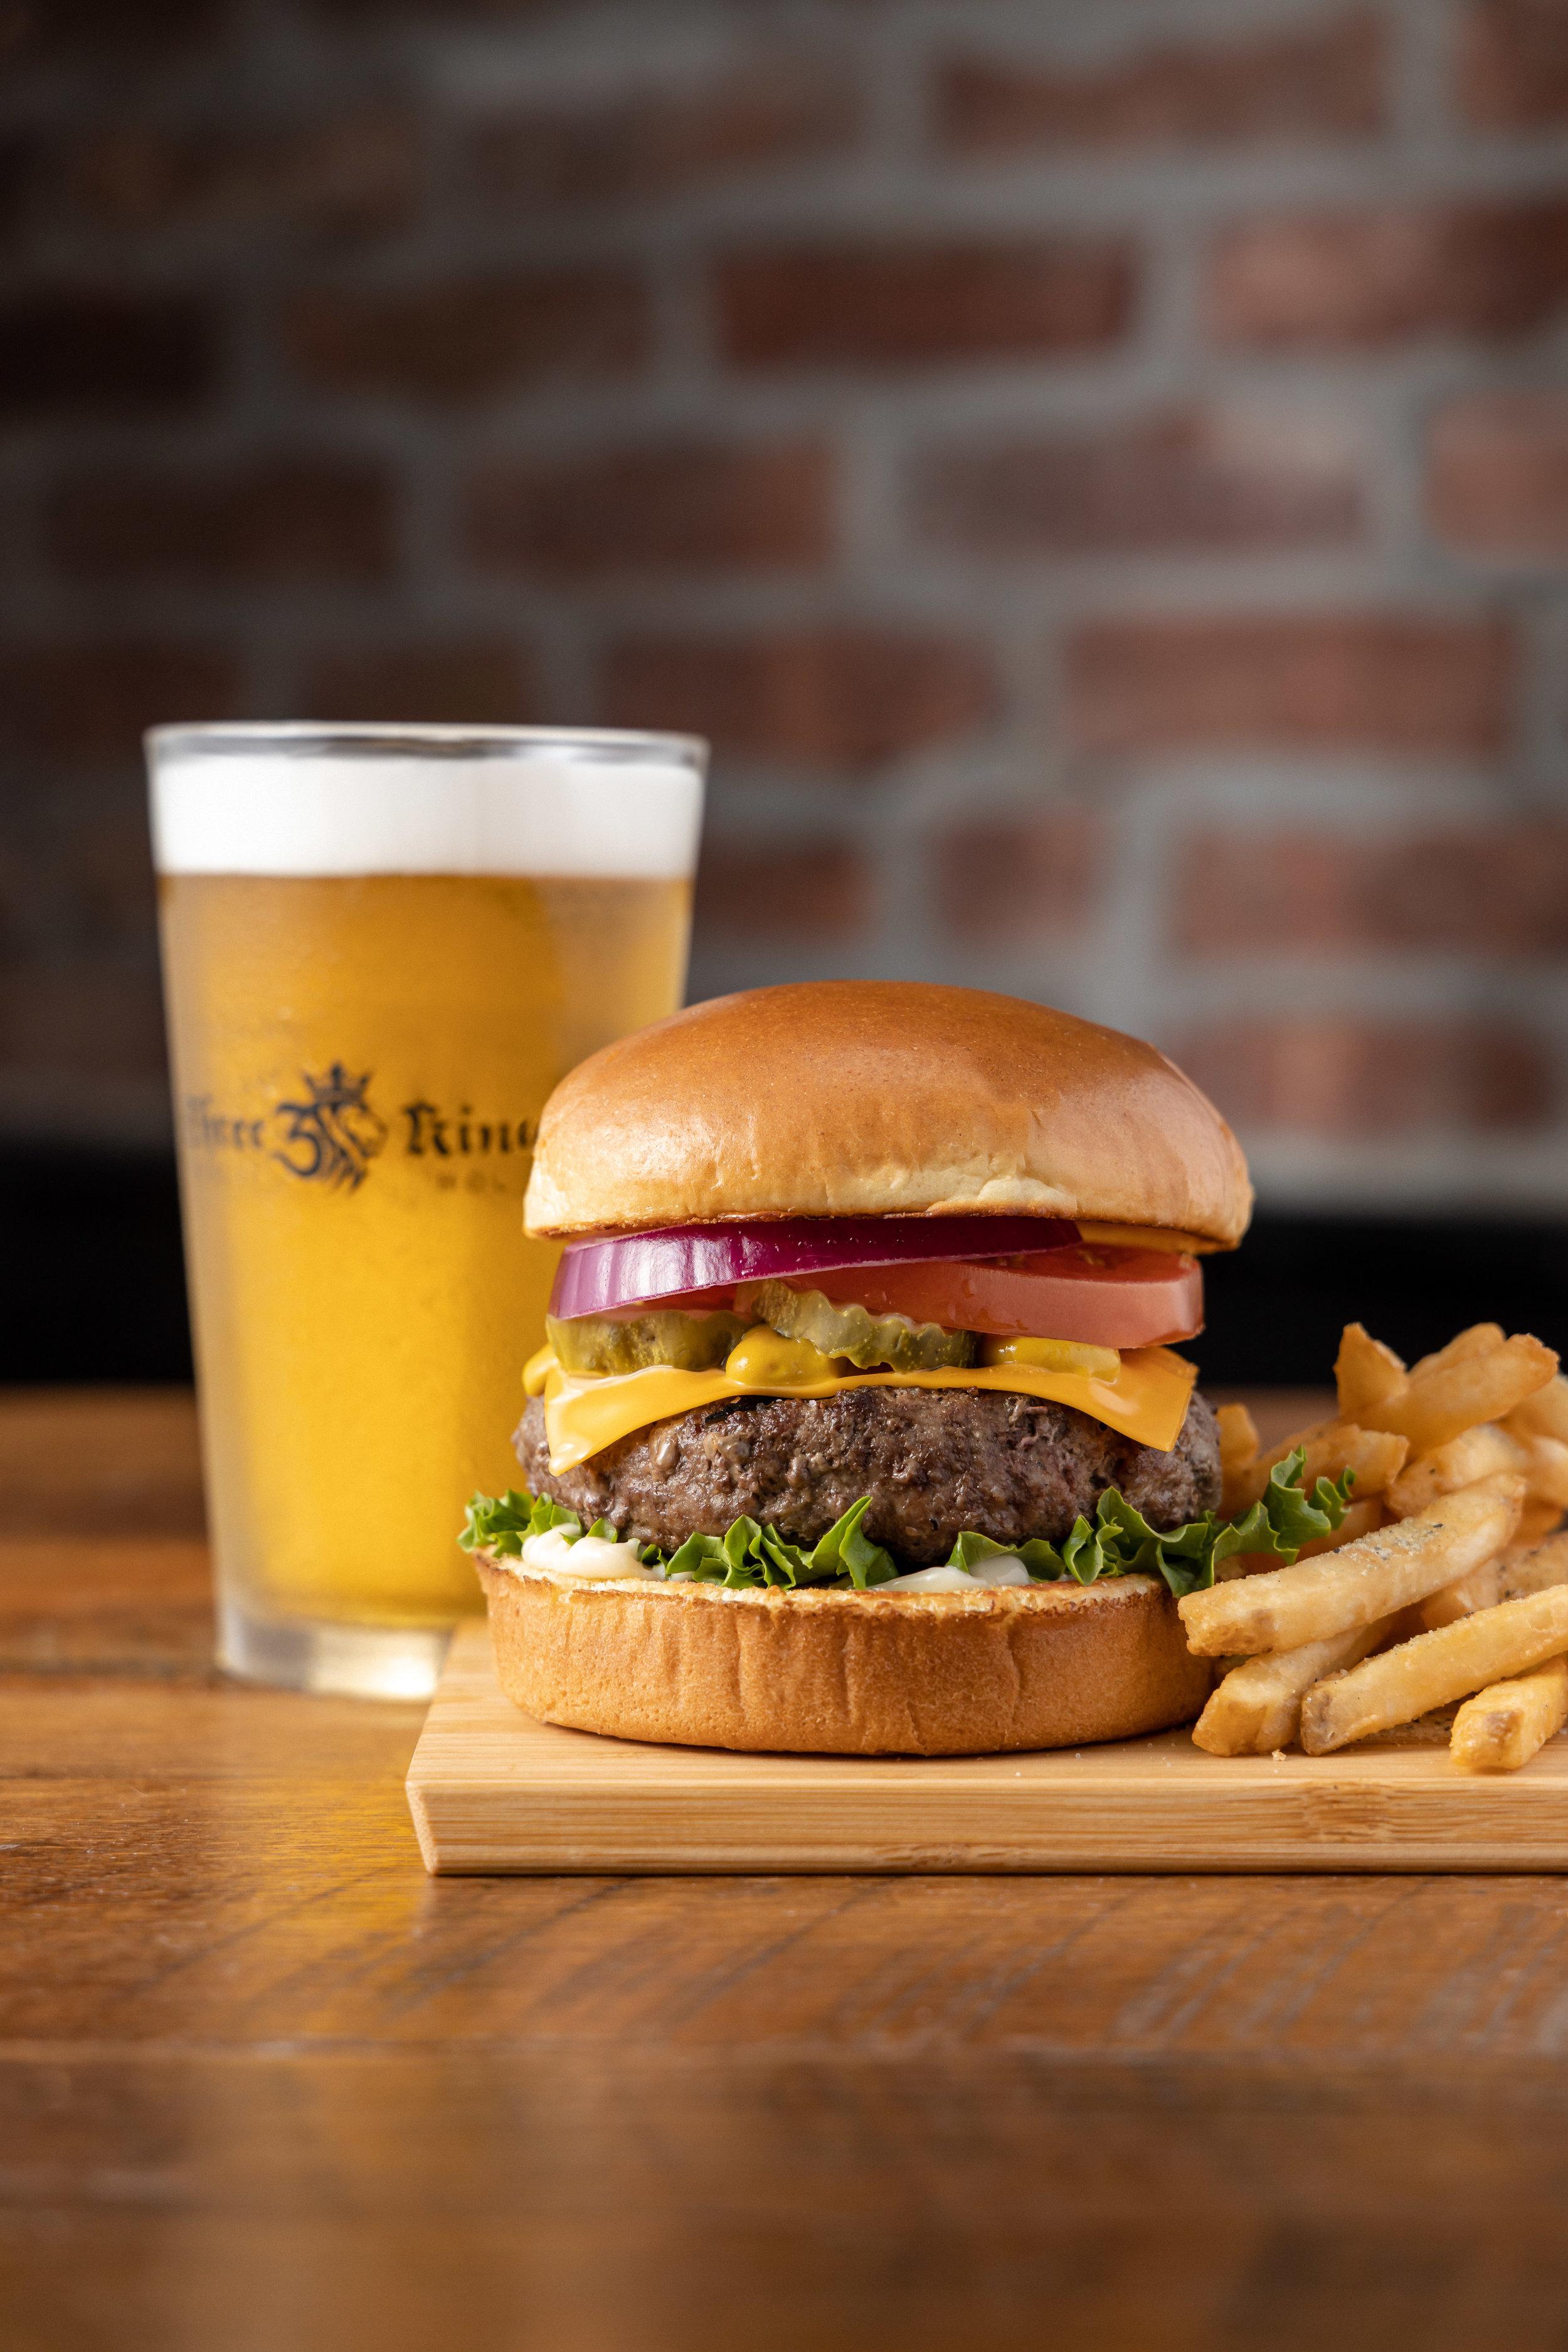 Three Kings Burger and 4 Hands Beer